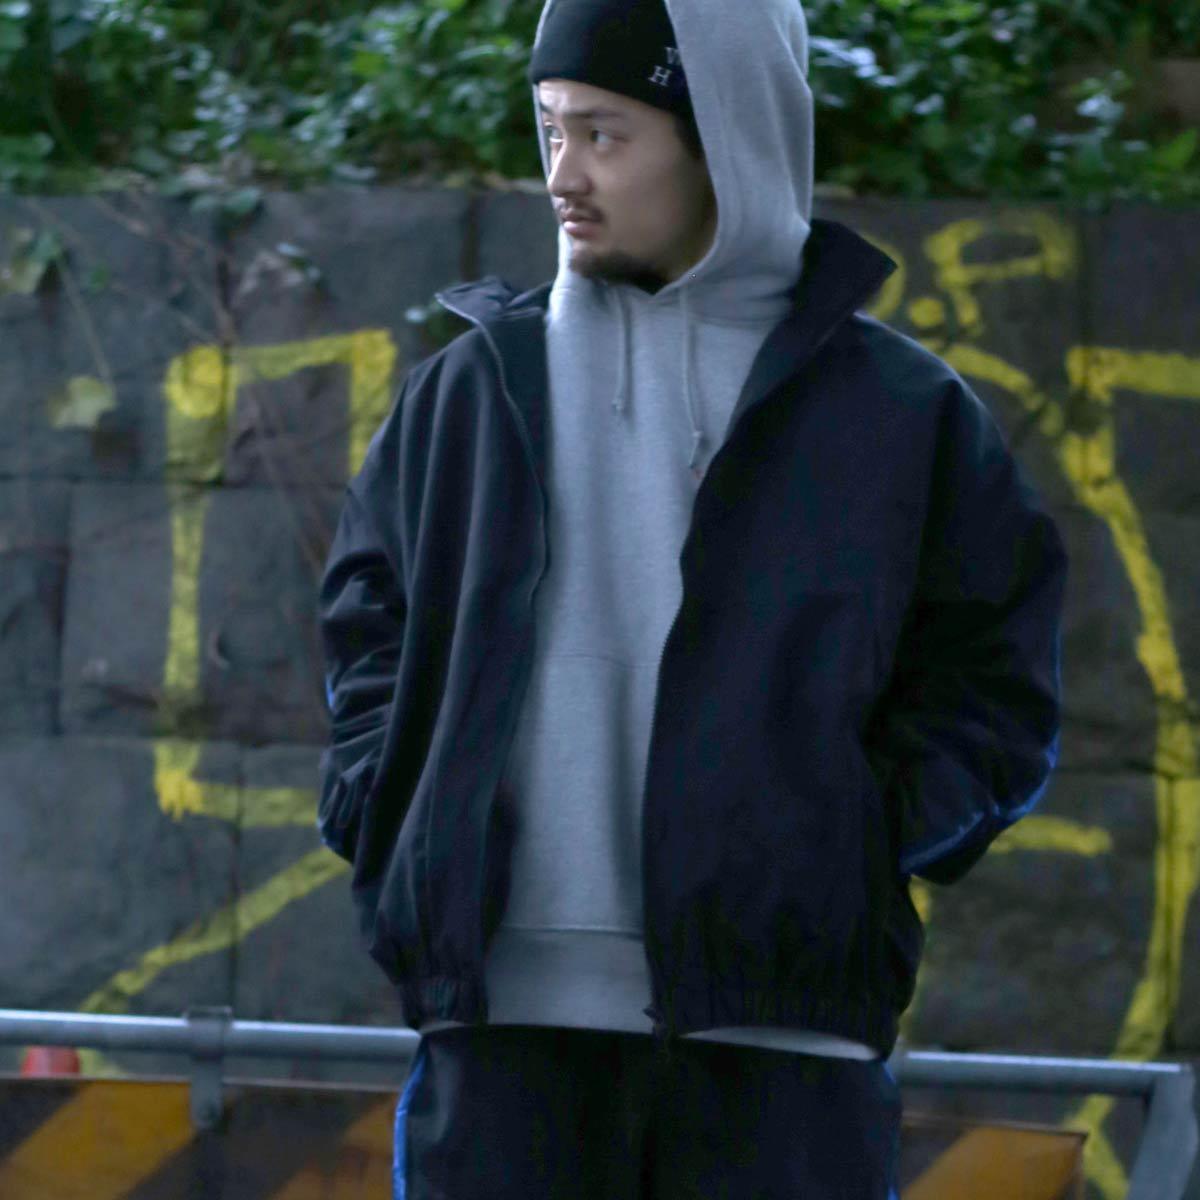 ATMOS LAB NYLON TRACK LINE JACKET (アトモスラボ ナイロン トラック ライン ジャケット) BLACK/BLUE【メンズ ナイロンジャケット】17HO-I